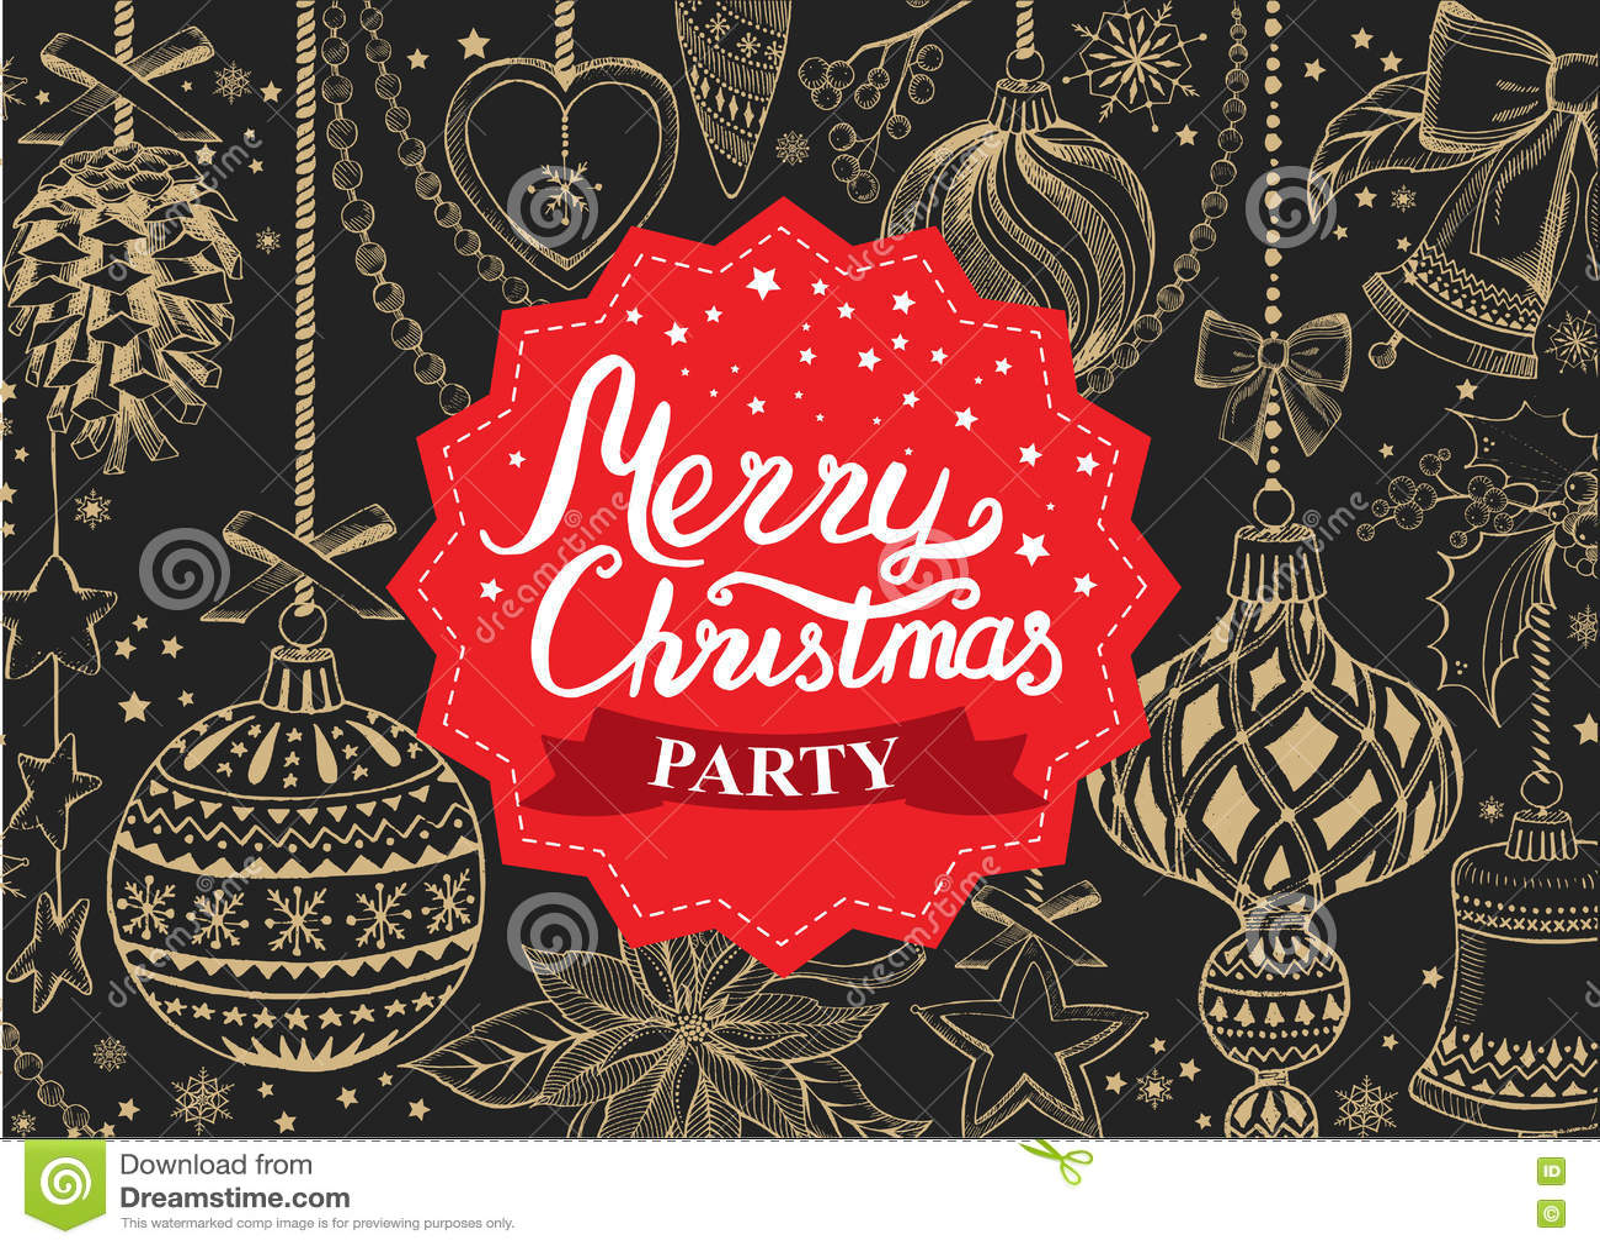 download christmas party invitation food menu restaurant stock vector illustration of invite